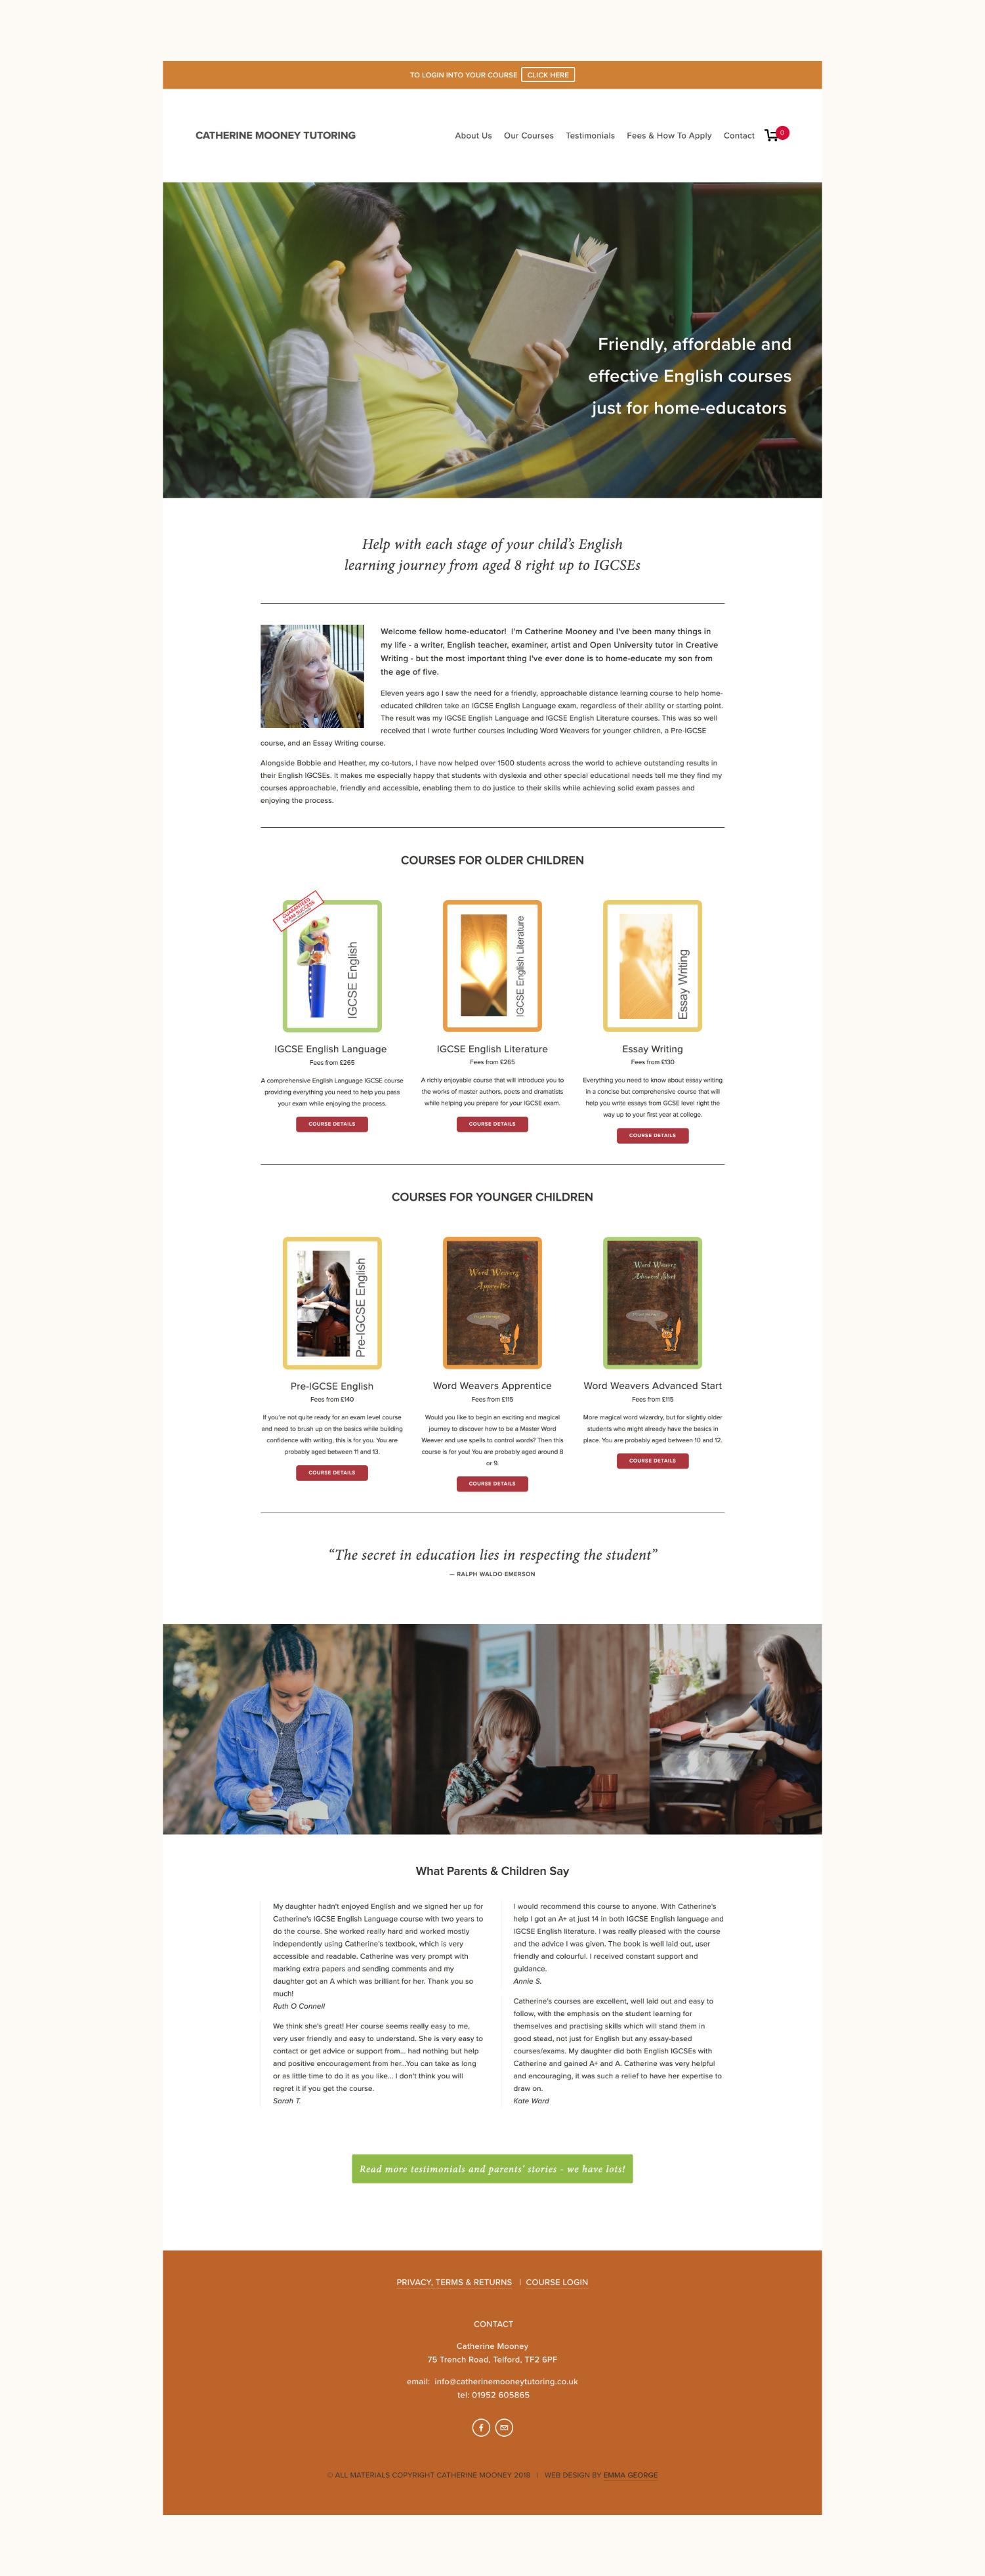 Squarespace website design for online English tutor Catherine Mooney